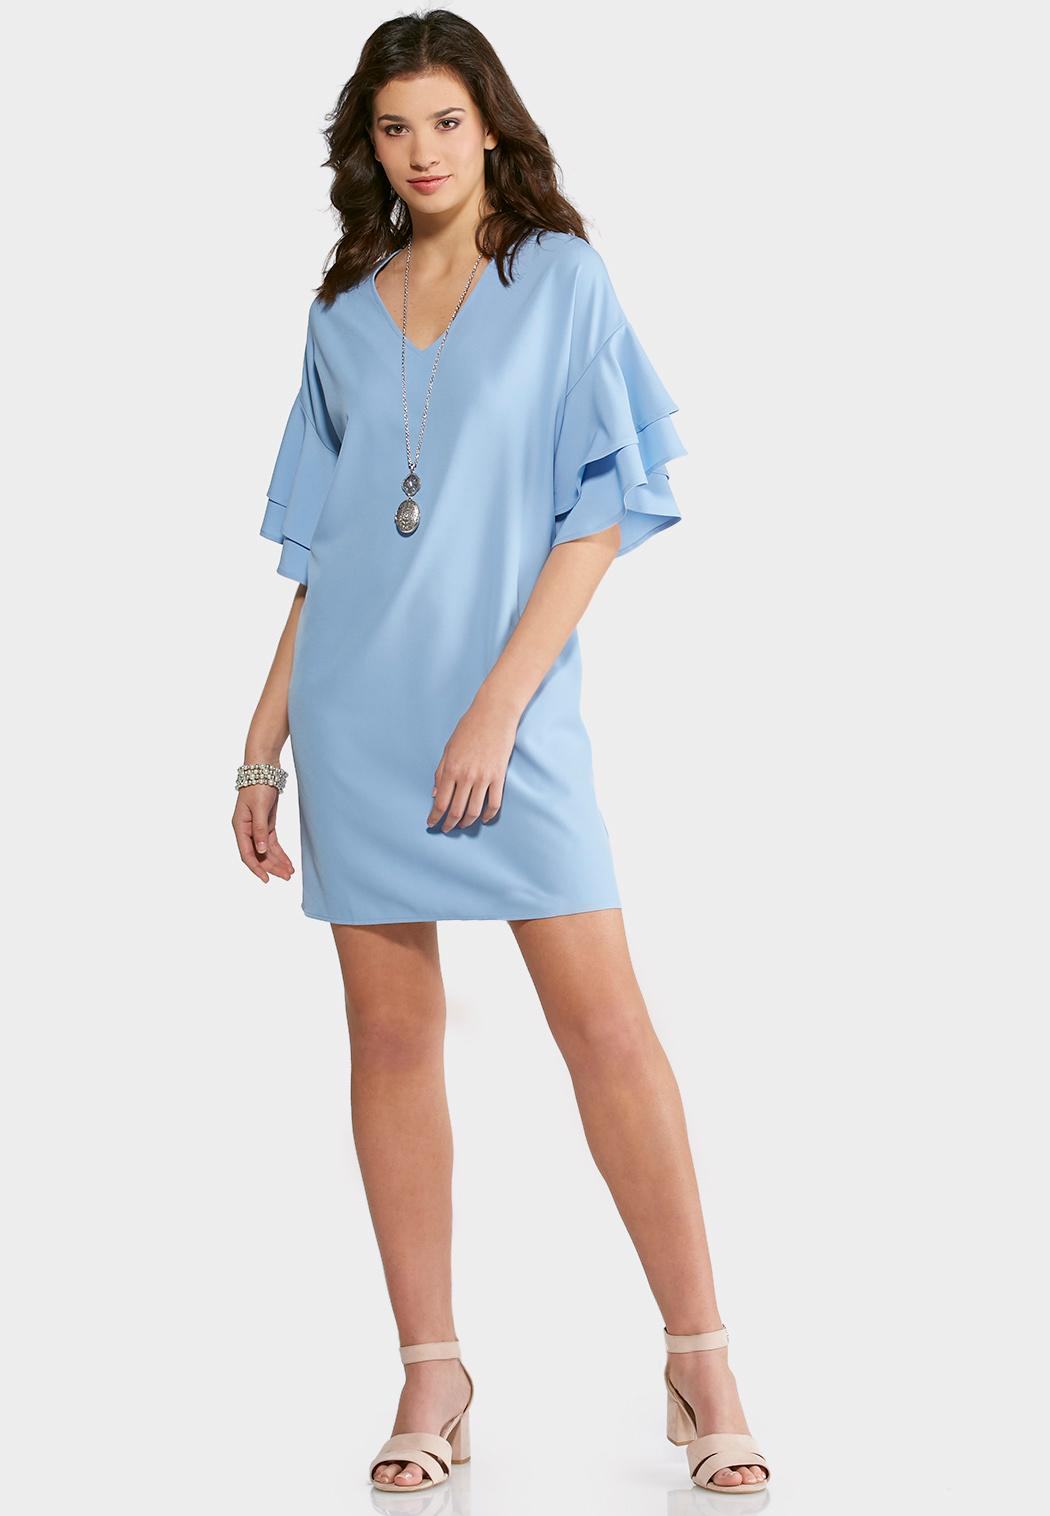 Plus Size Tiered Ruffle Sleeve Dress Plus Sizes Cato Fashions